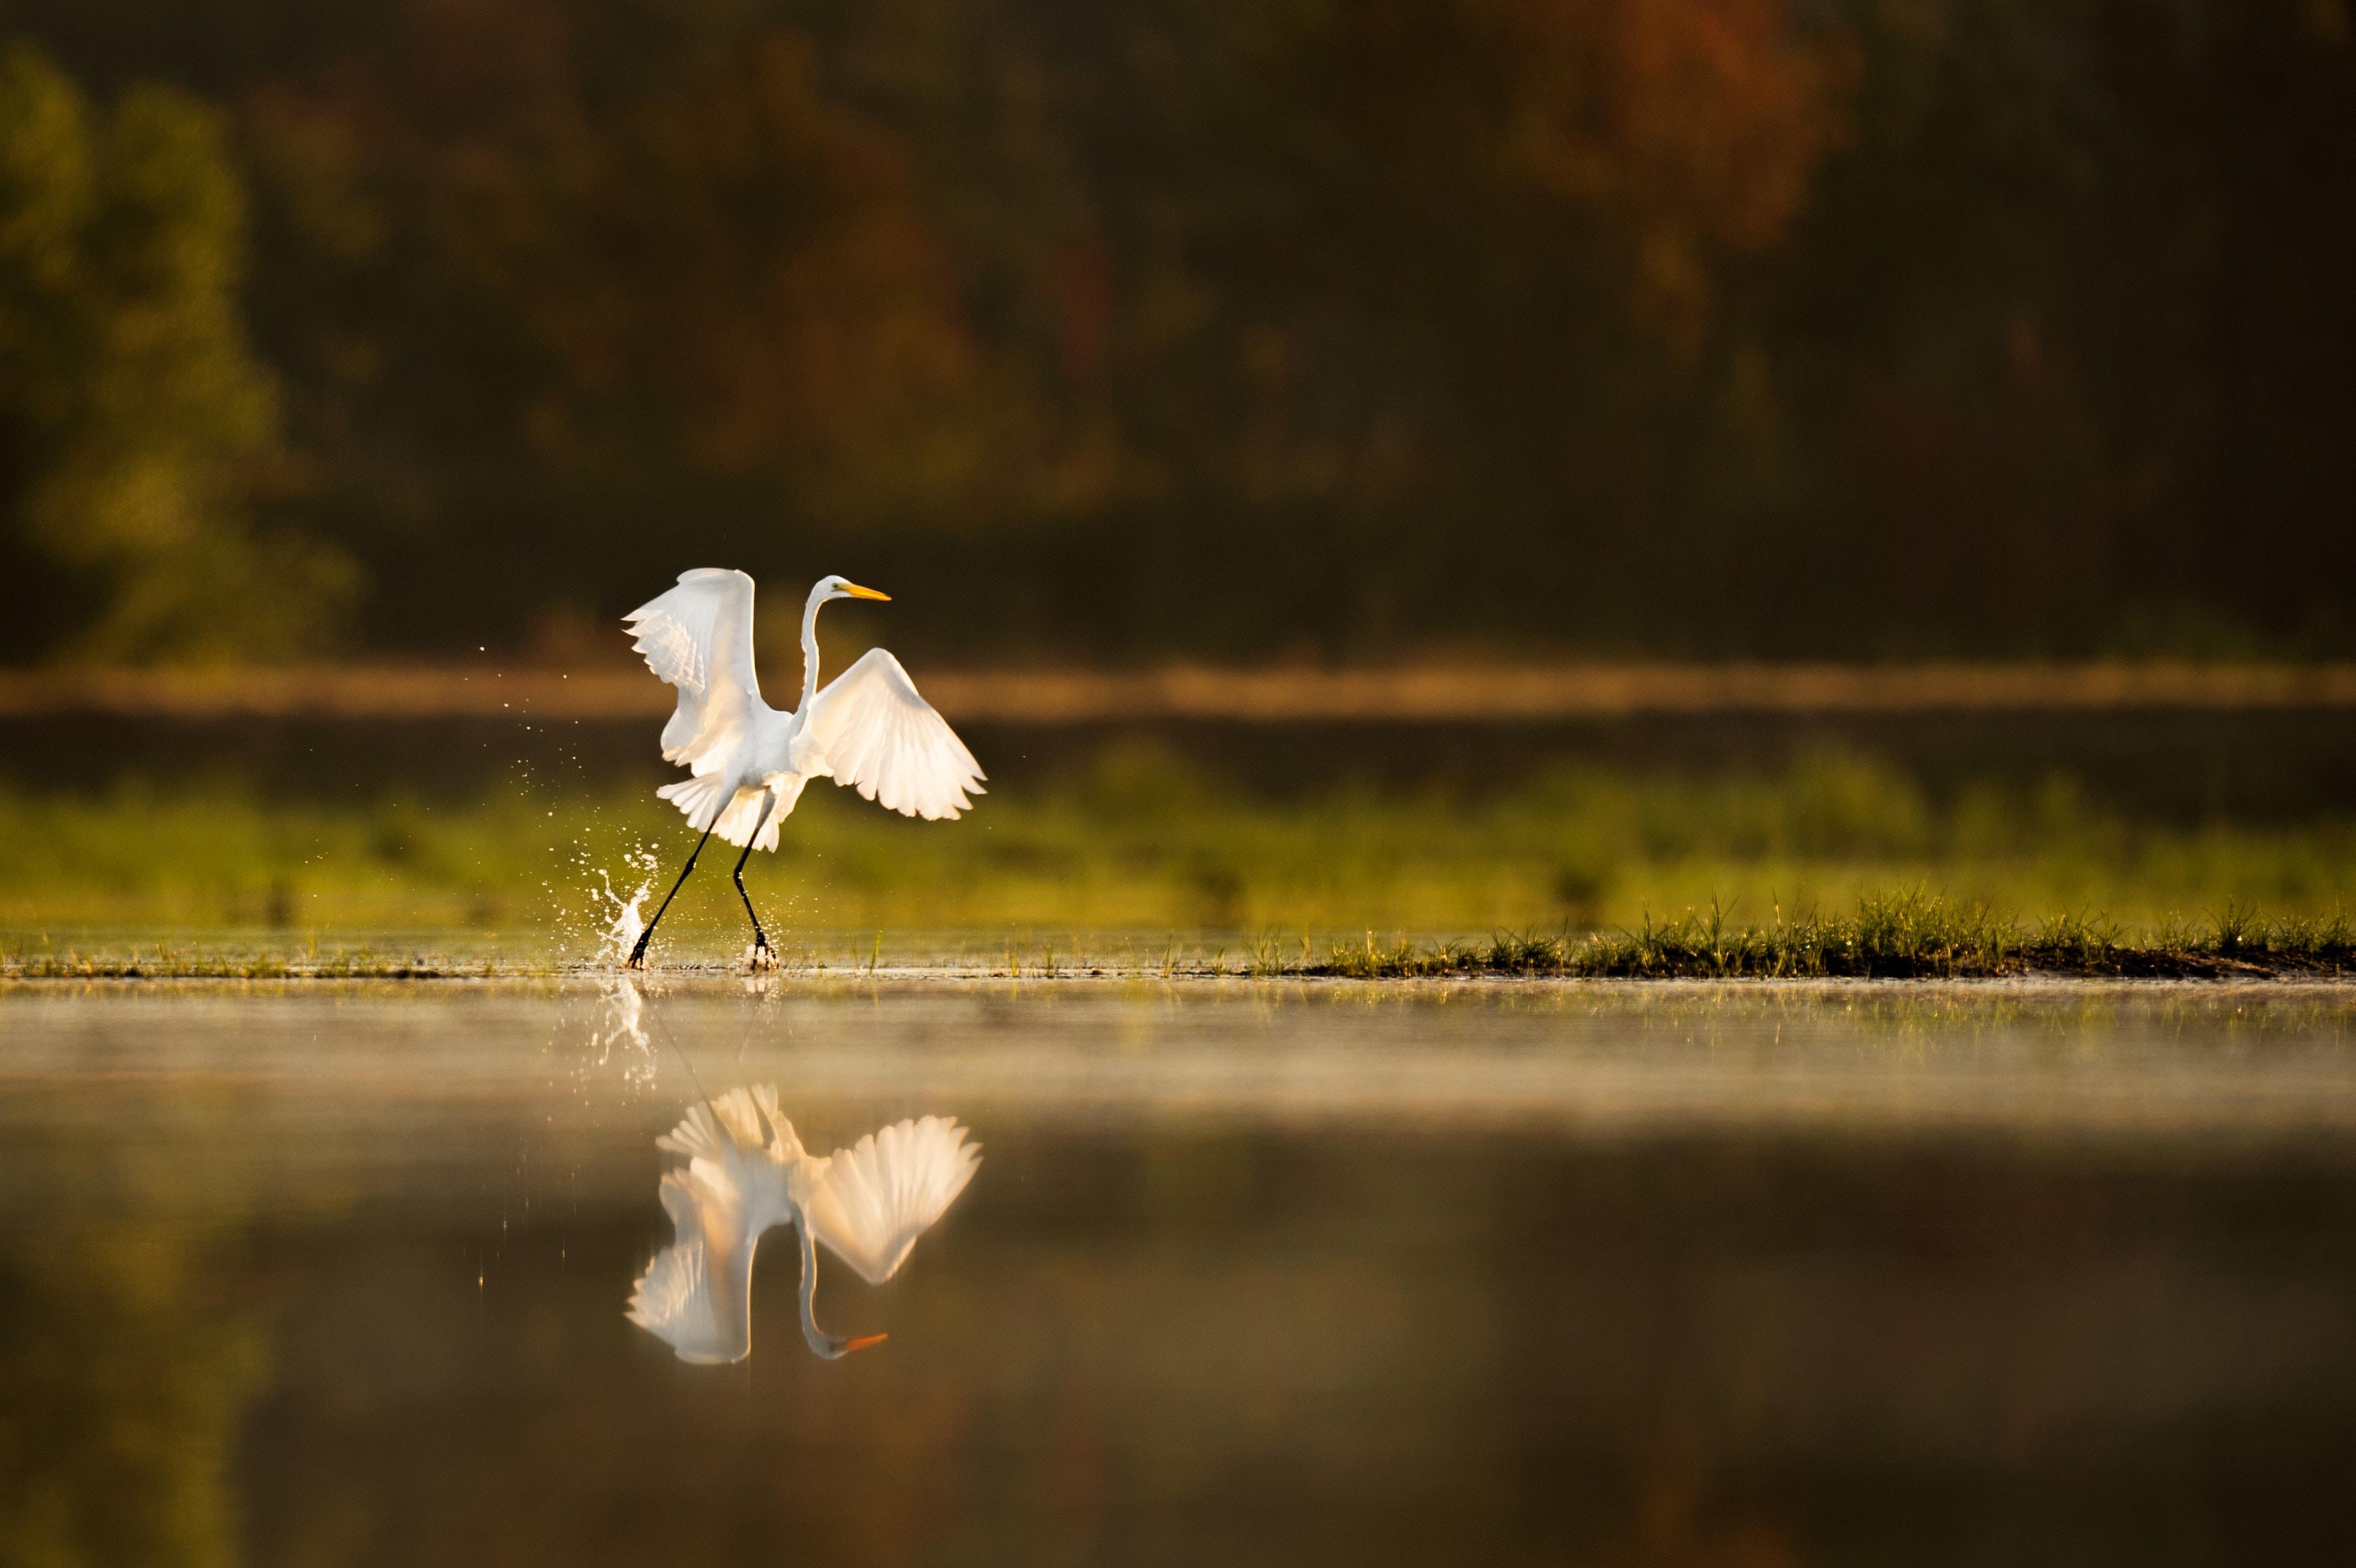 white crane bird walking near body of water